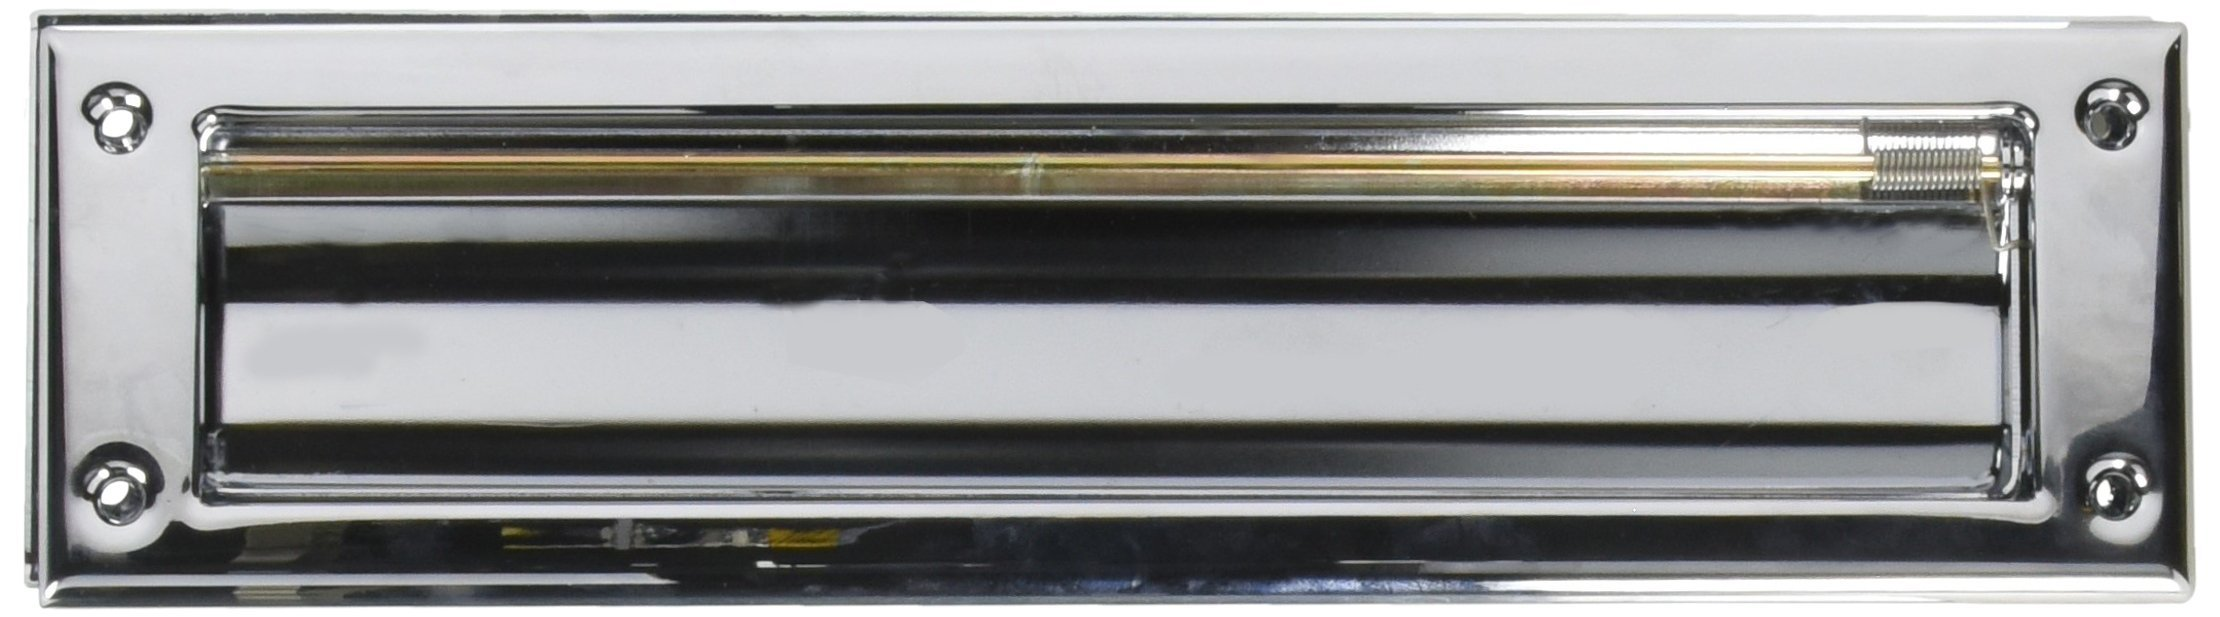 Baldwin 0012260 Letter Box Plate, Bright Chrome